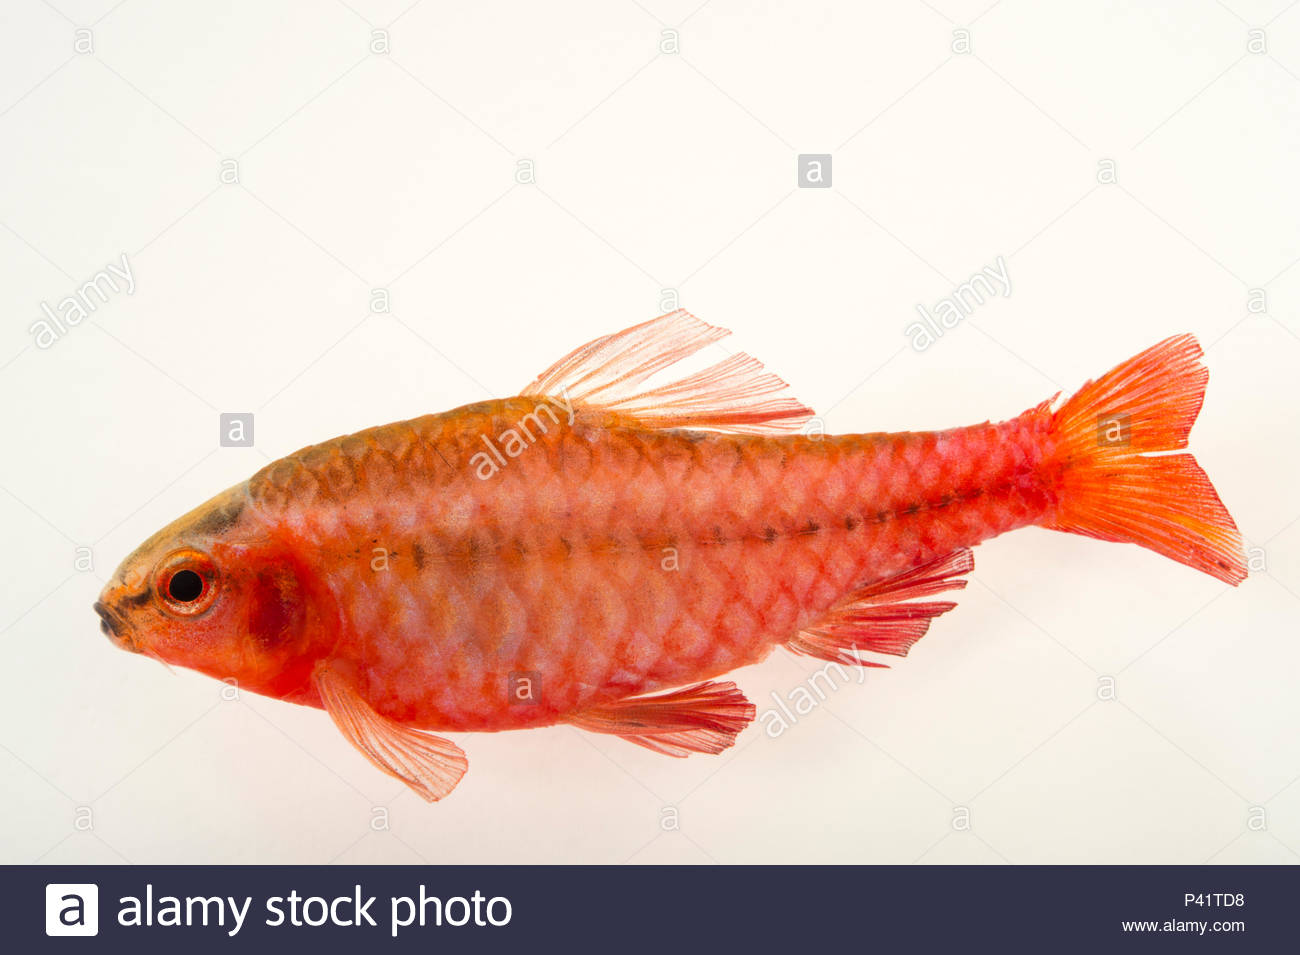 Cherry barb, Puntius titteya, at L'aquarium tropical du palais de la Porte Doree. - Stock Image